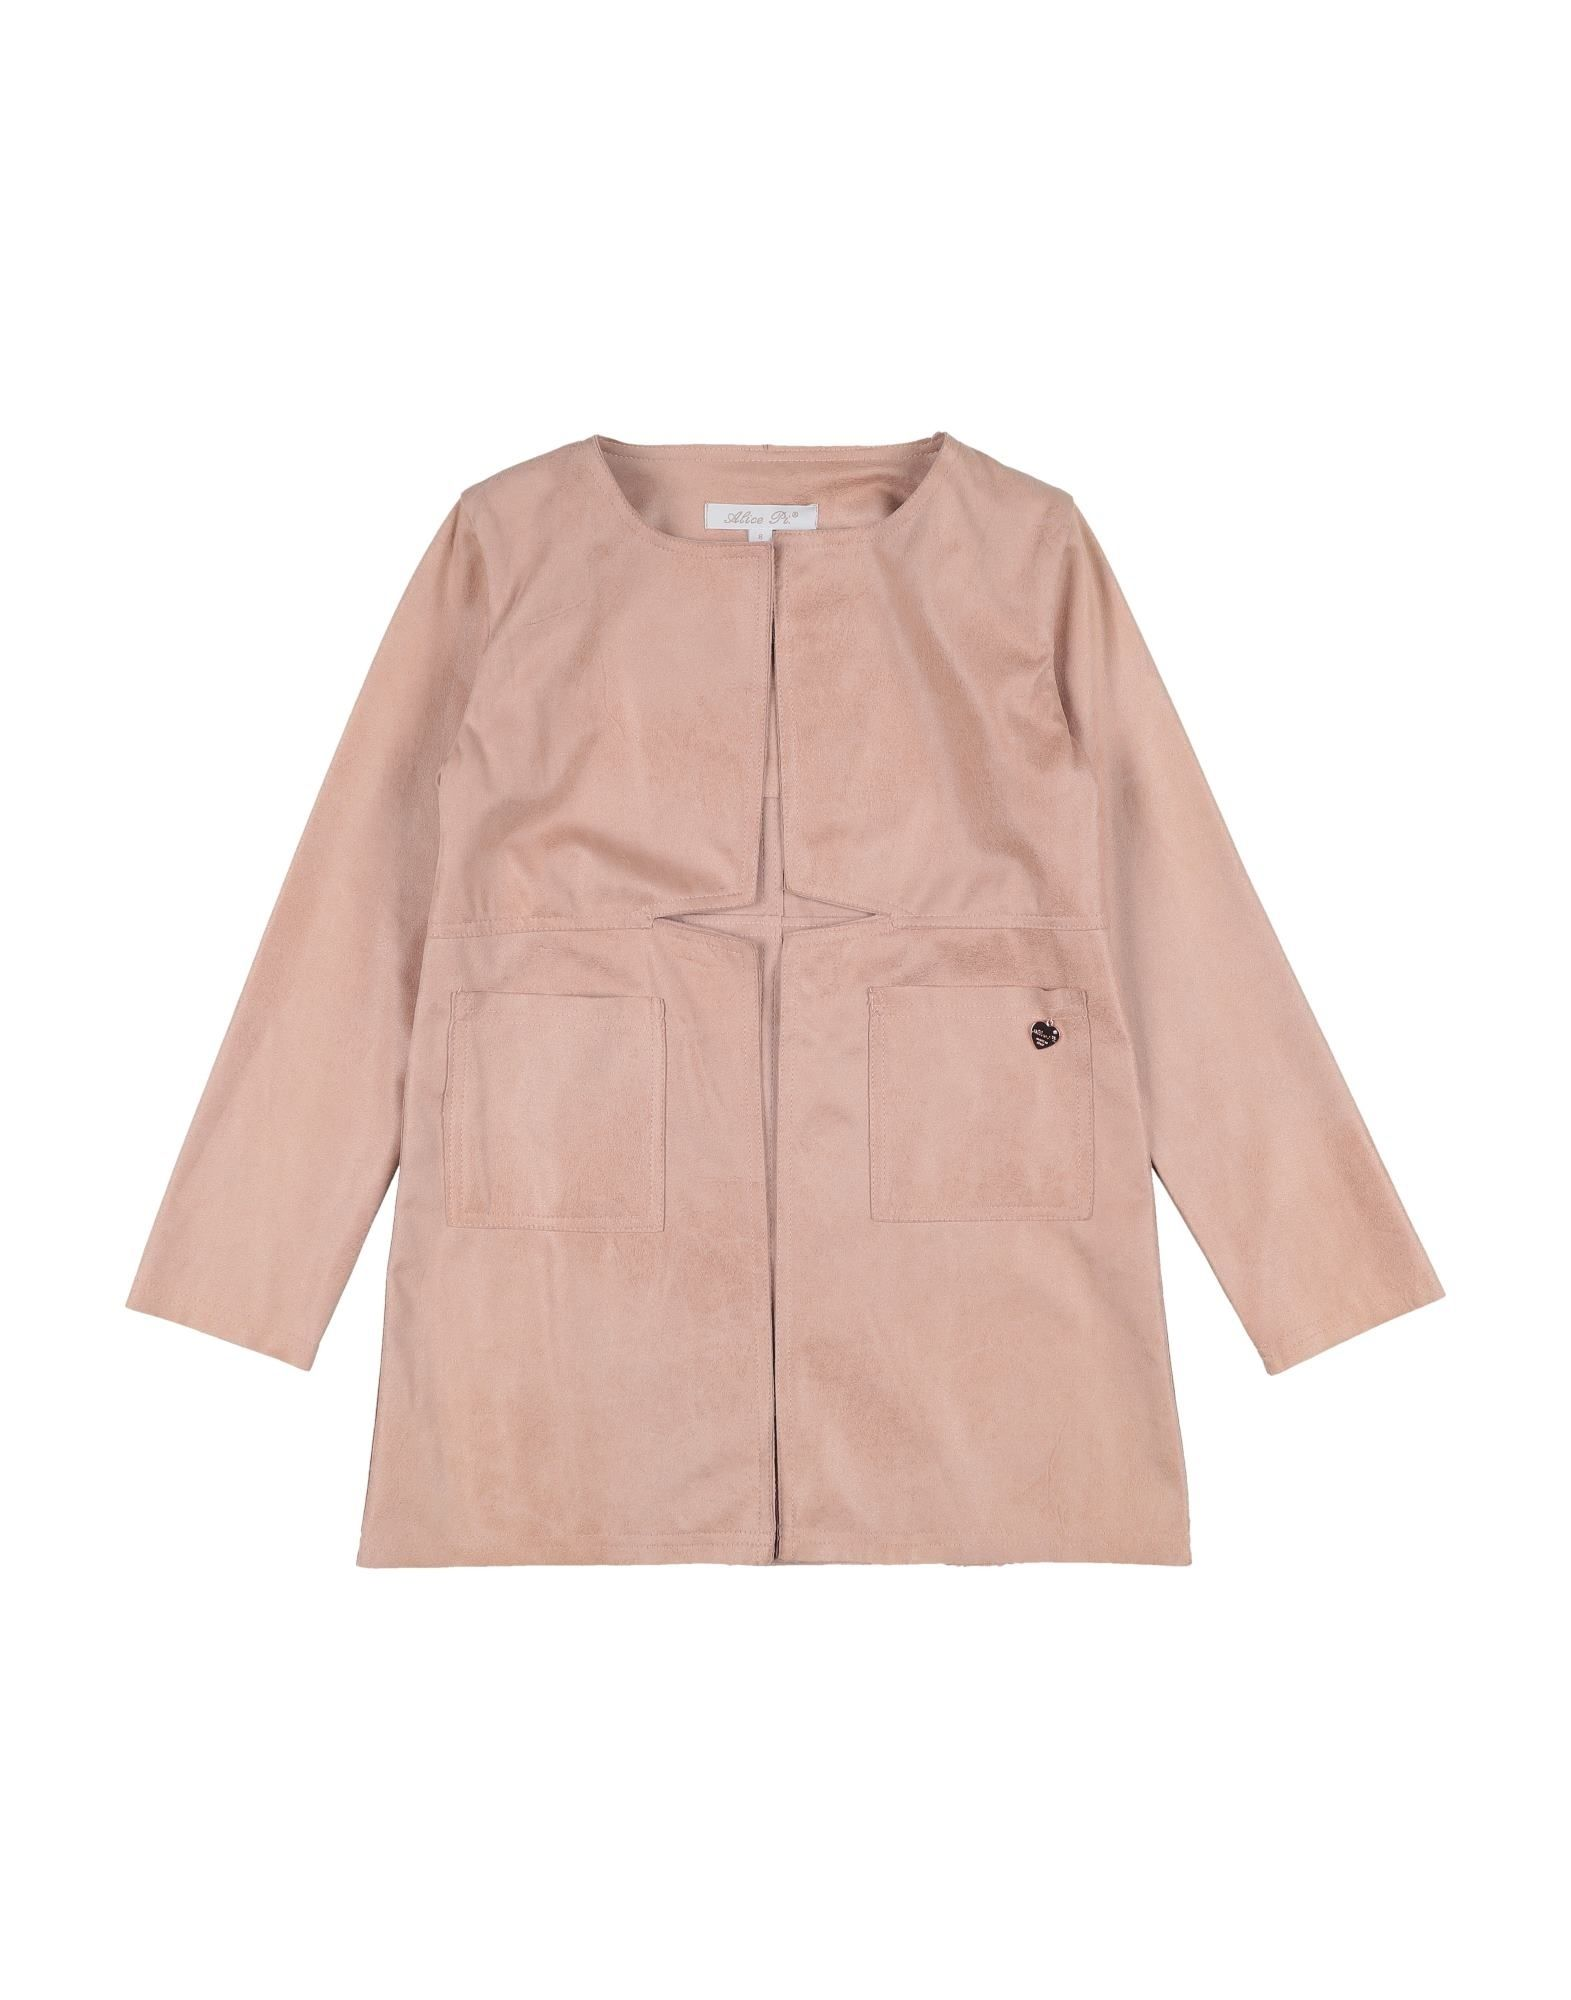 Alice Pi. Kids' Overcoats In Pink